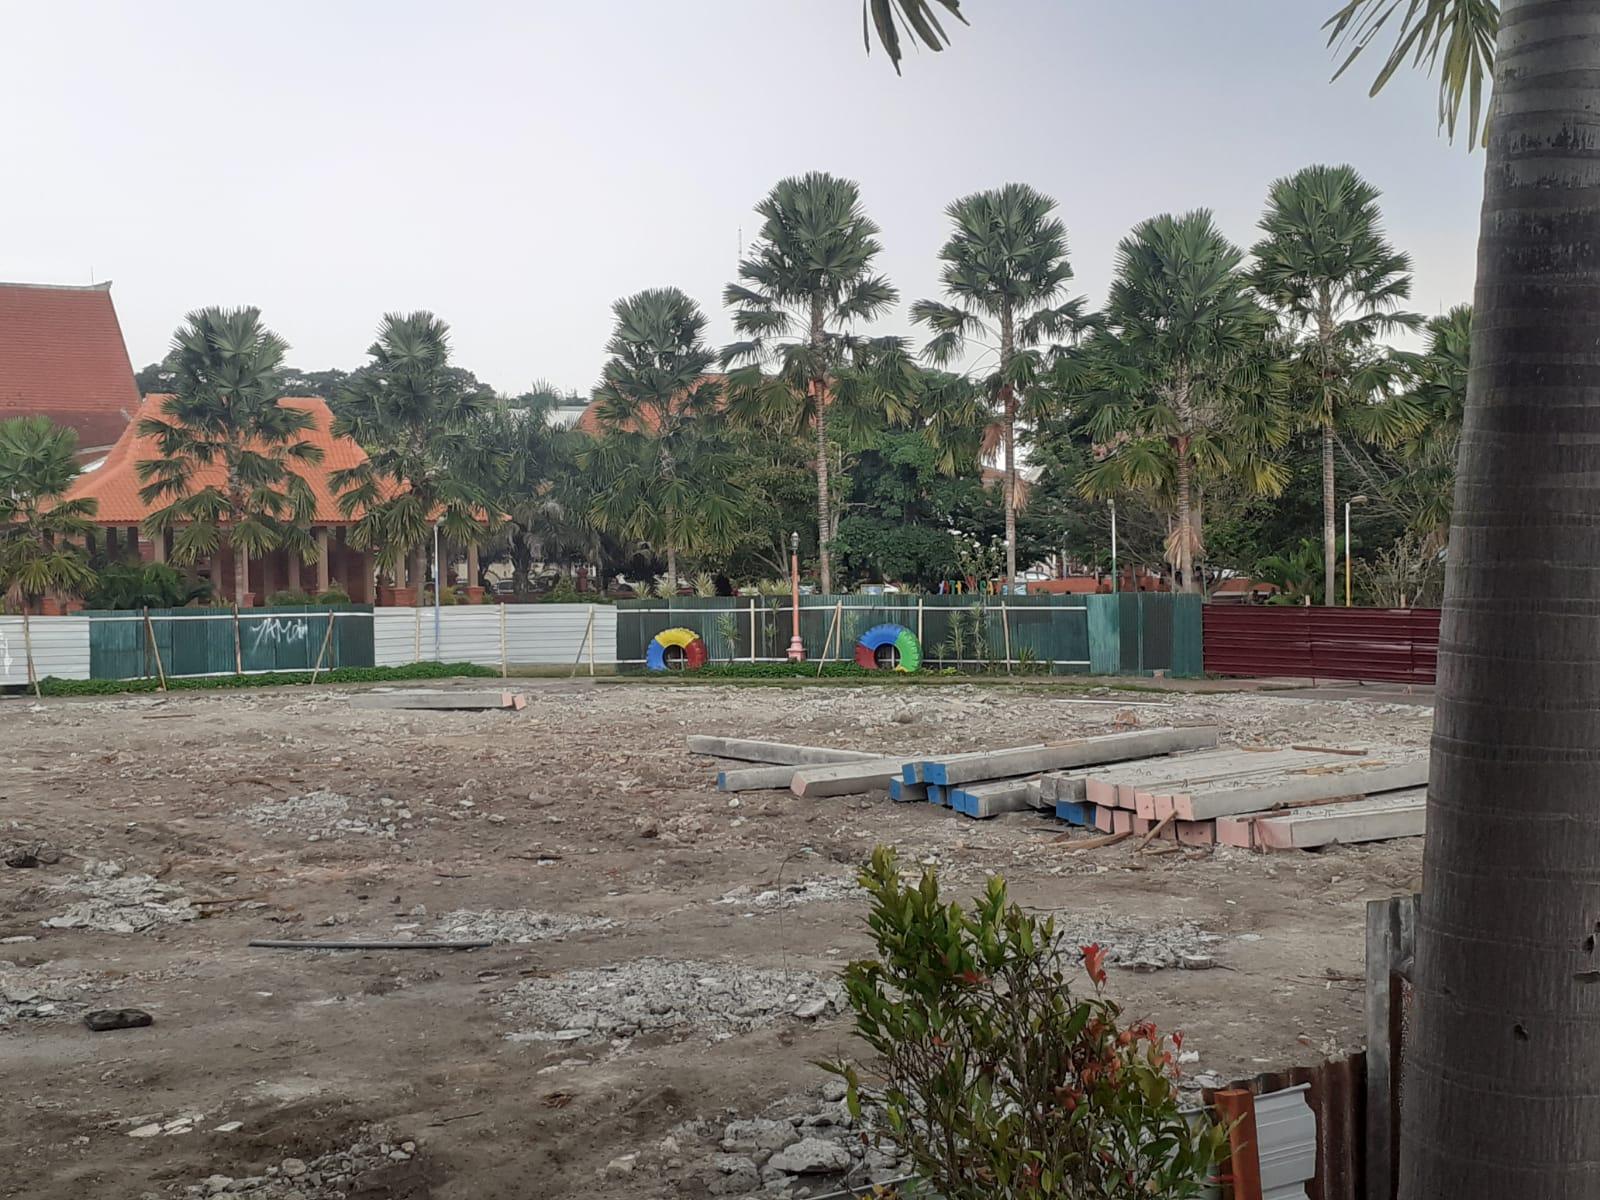 Proyek Taman Alun Alun Tugu Majapahit Mojokerto